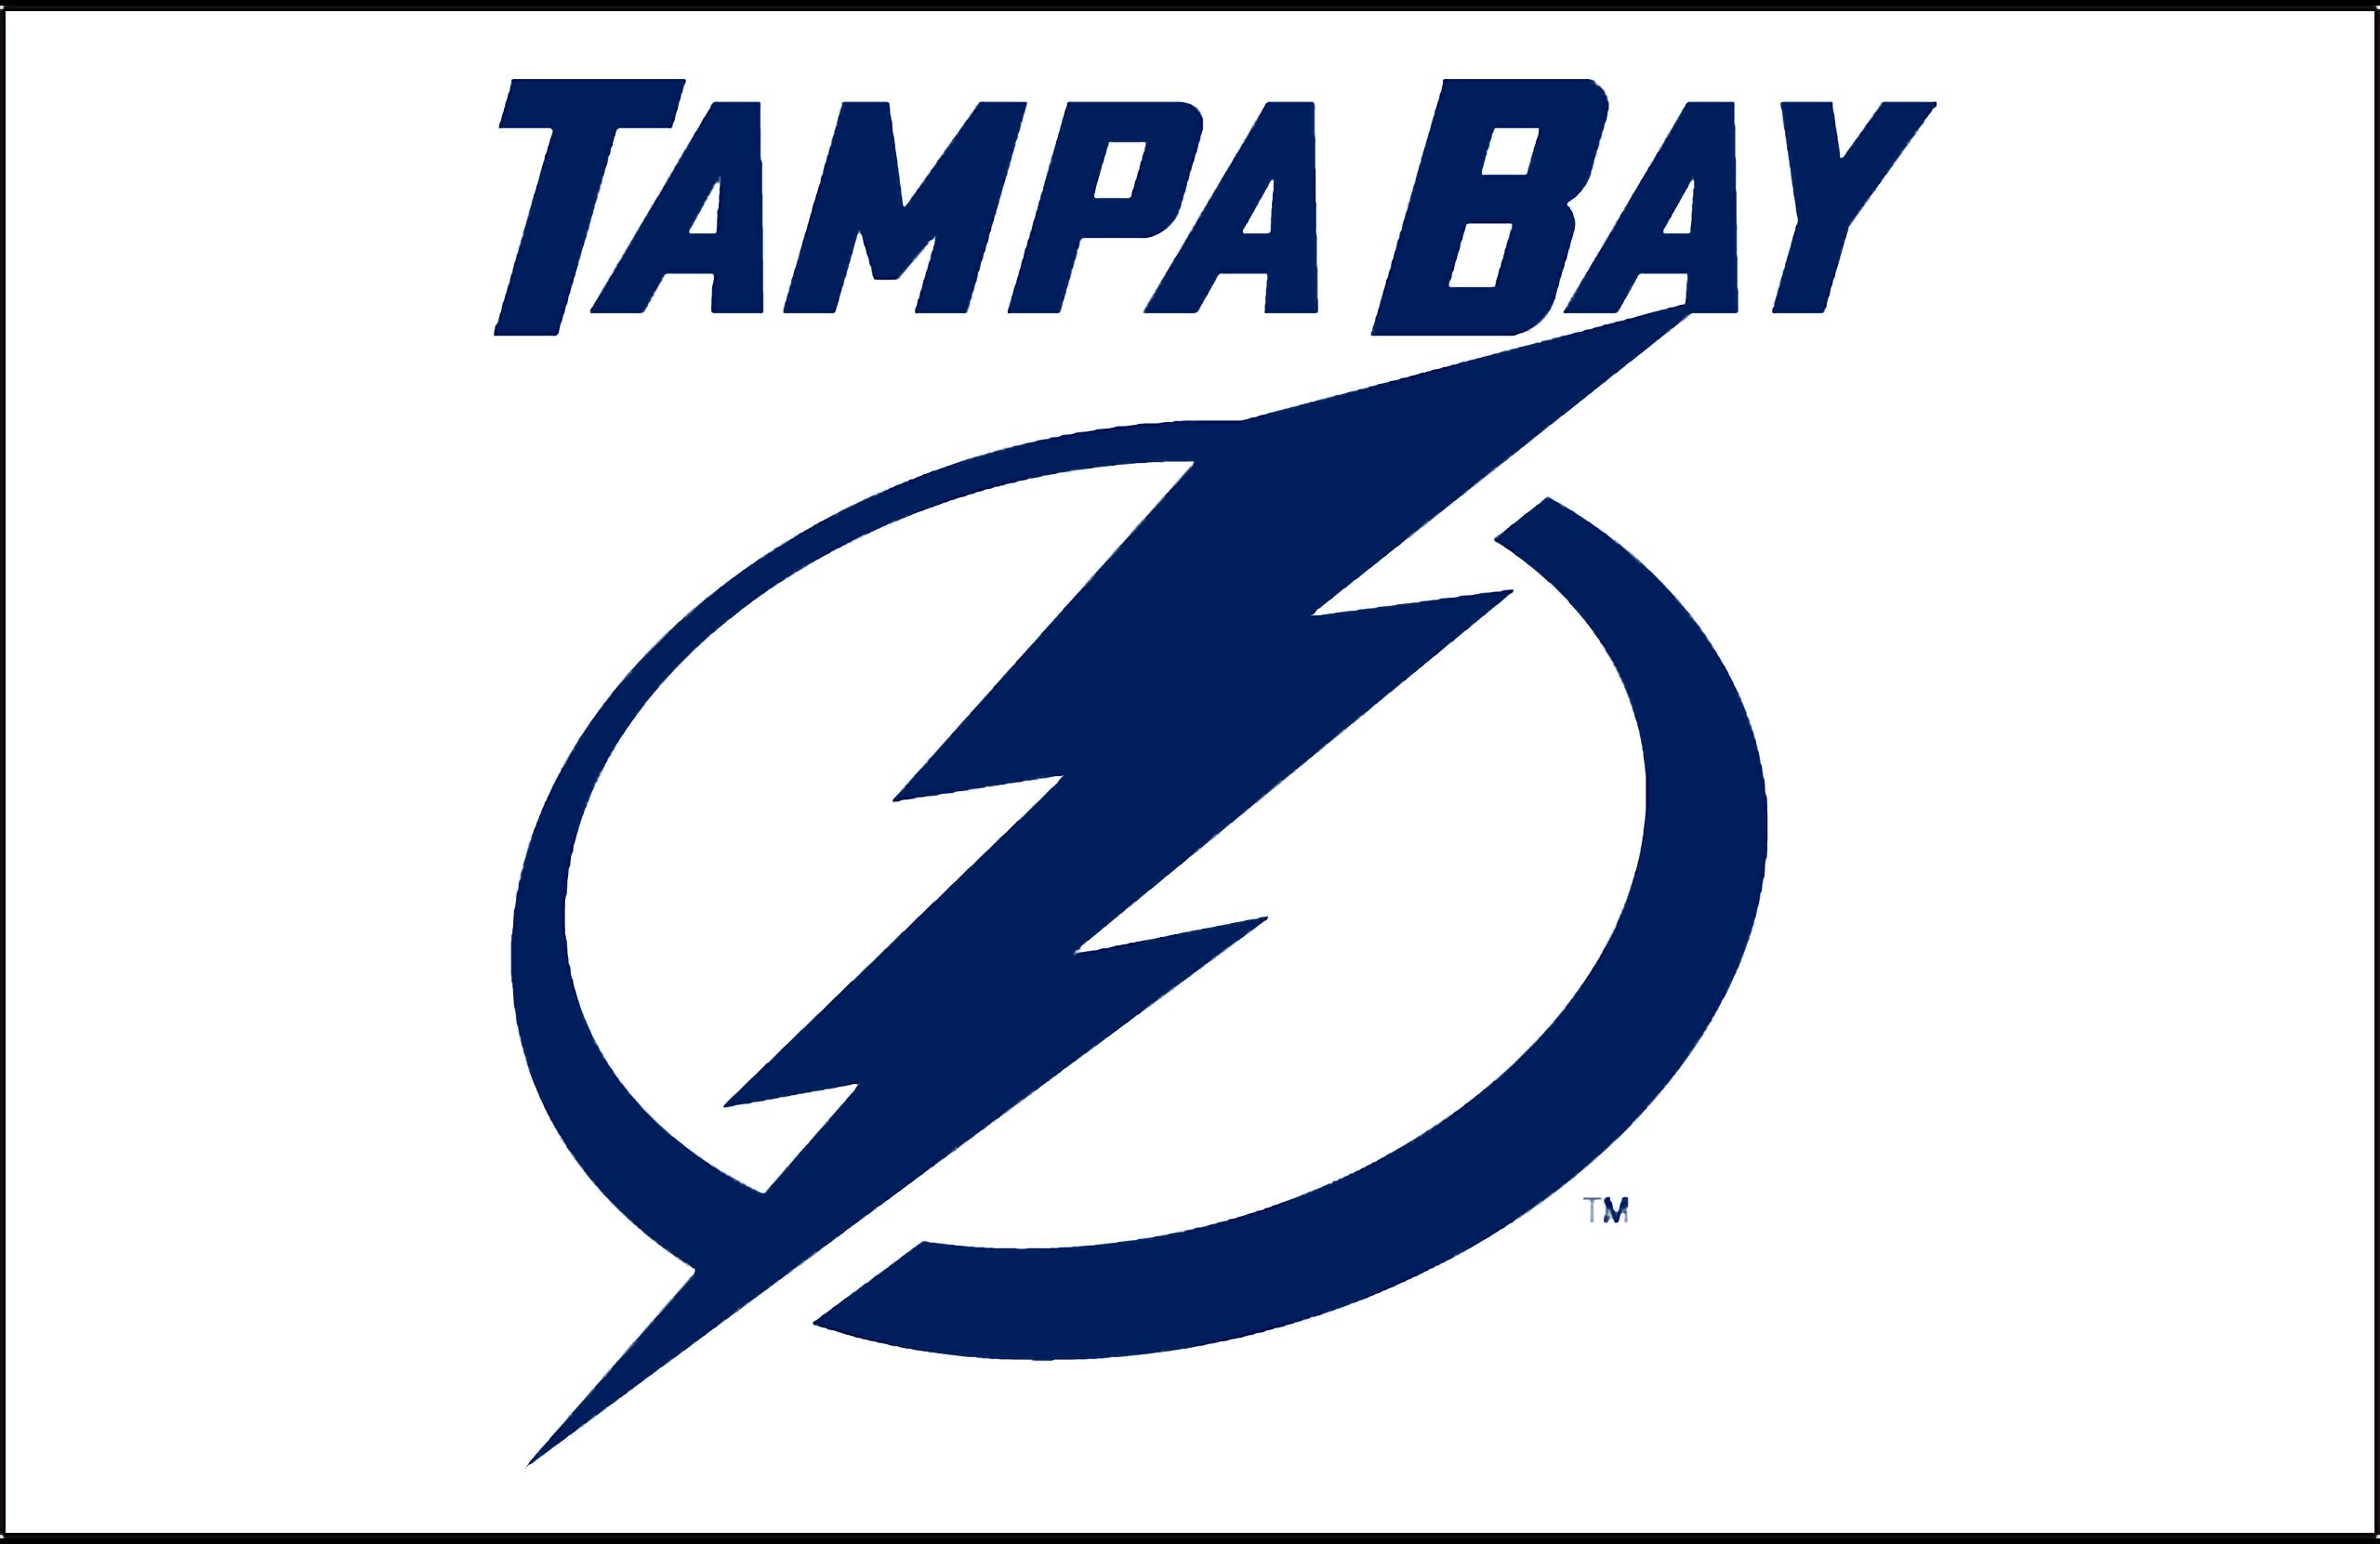 Tampa Bay Lightning Hd Wallpaper Tampa Bay Lightning Logo 2011